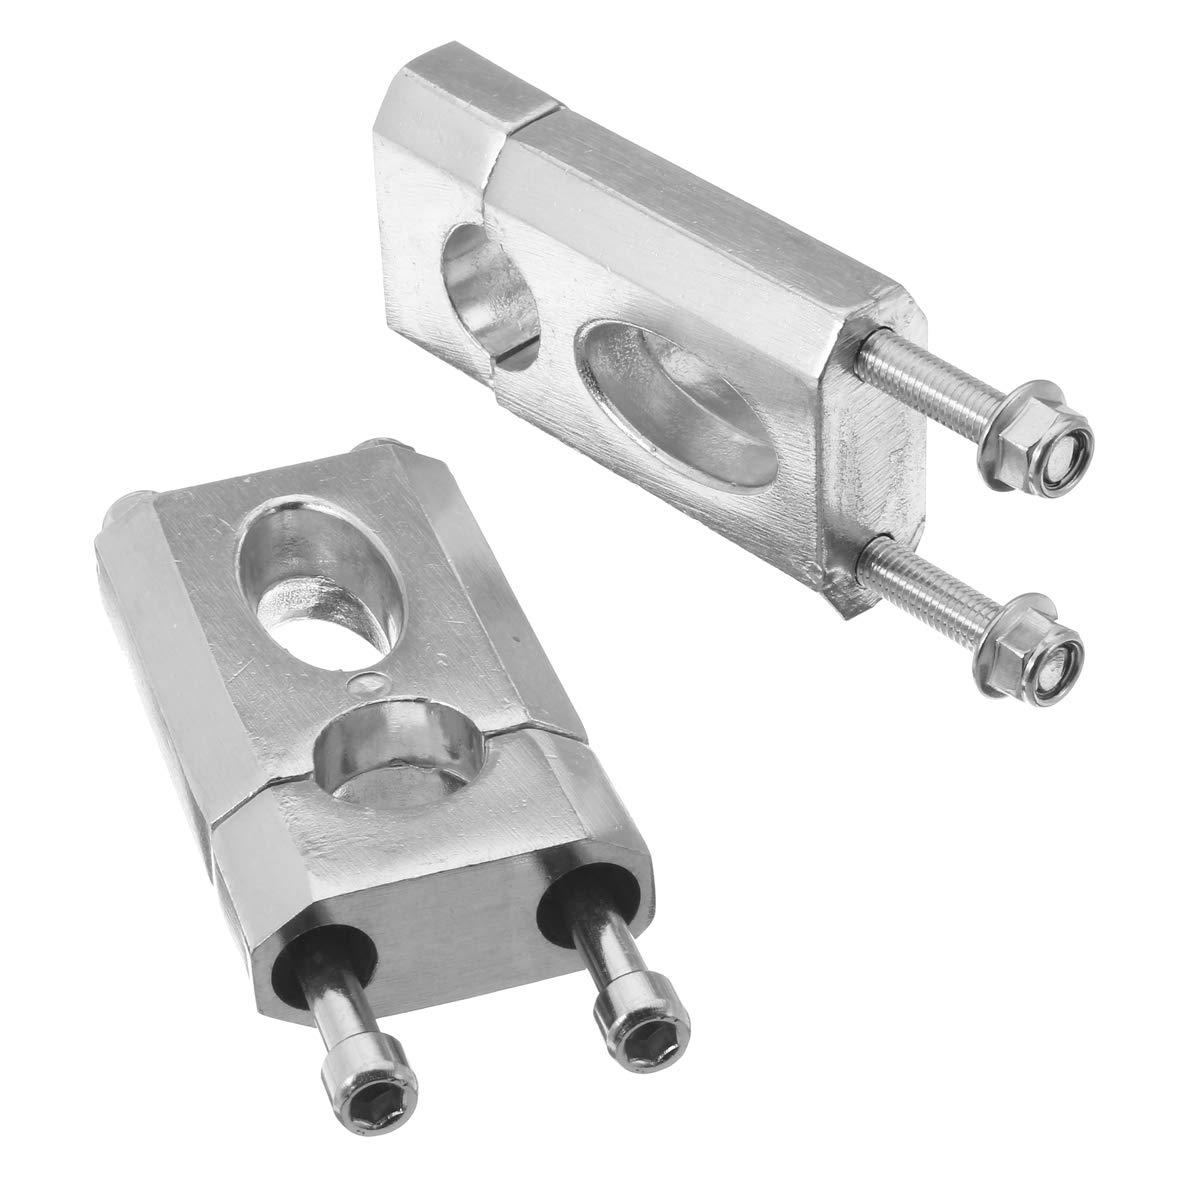 Aluminio 7//8 /'/' 22 mm Manillar Abrazadera Montaje vertical 50cc 110cc 125cc Dirt